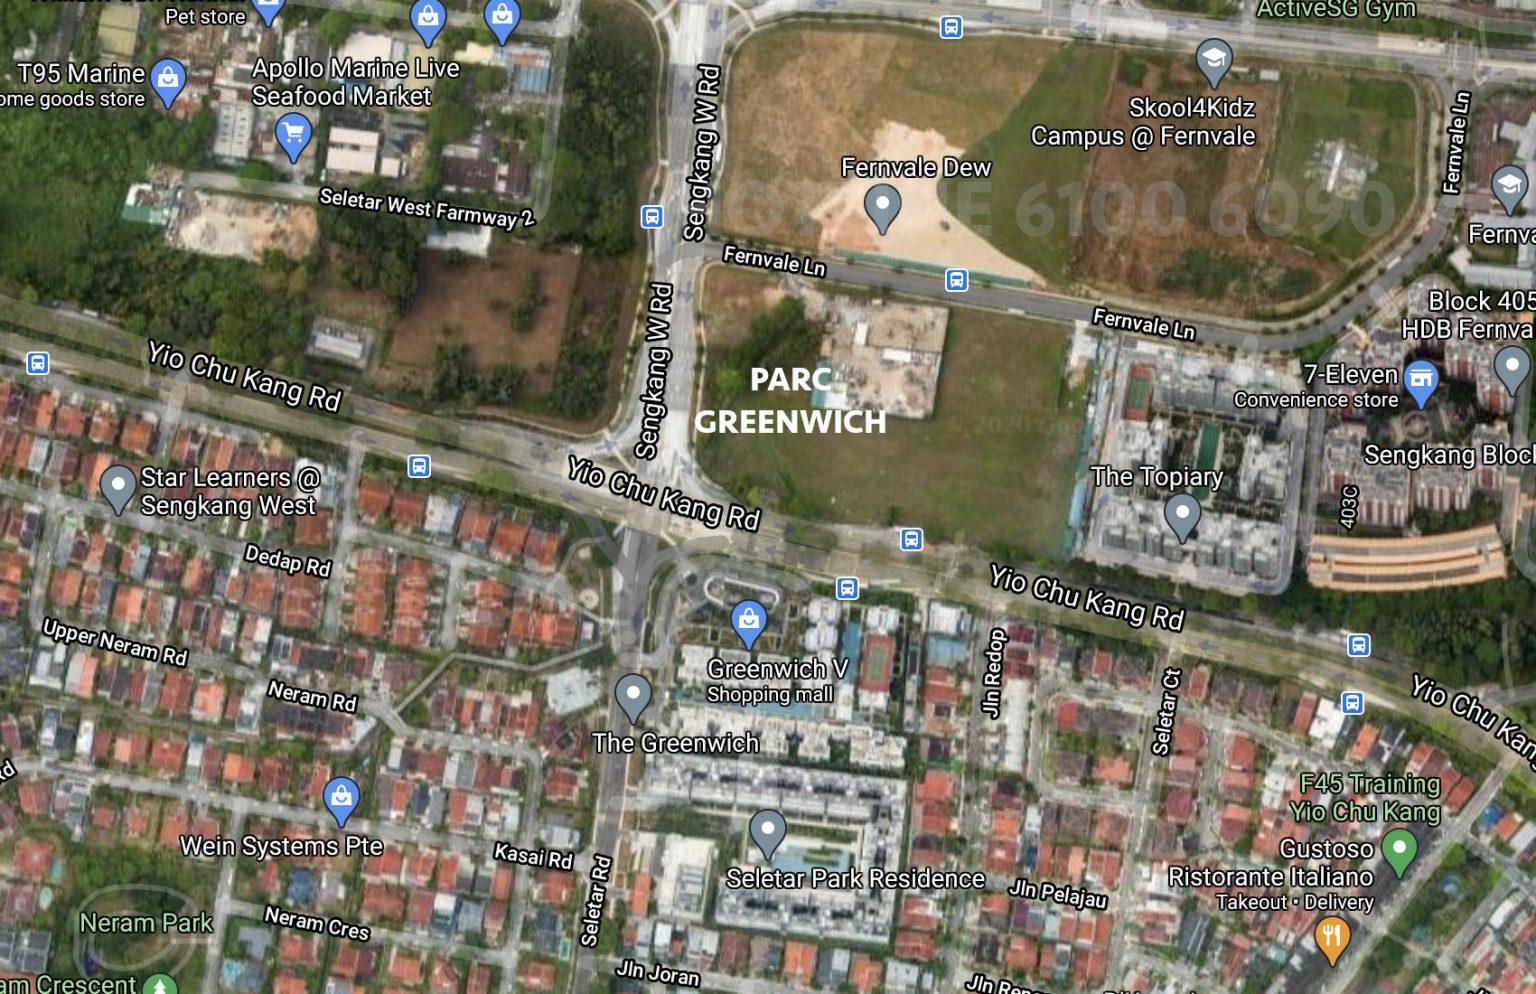 Parc-Greenwich-Location-Plan-Fernvale-Lane-1